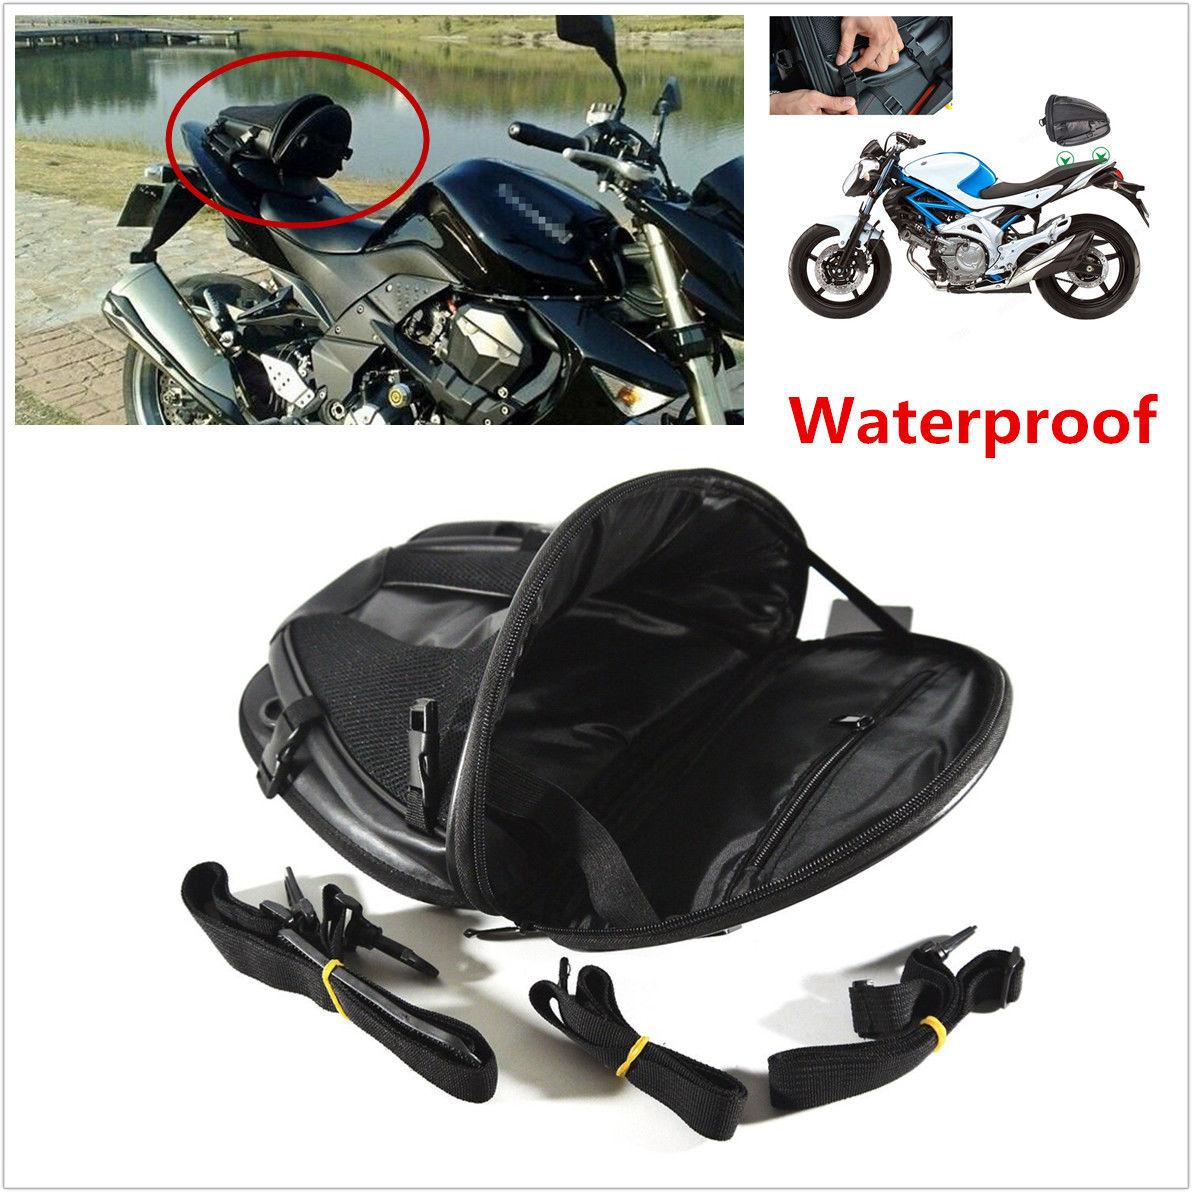 ff5cf7d0d285 Waterproof Motorcycle Tail Bag Saddlebag Sports Luggage Back Seat ...